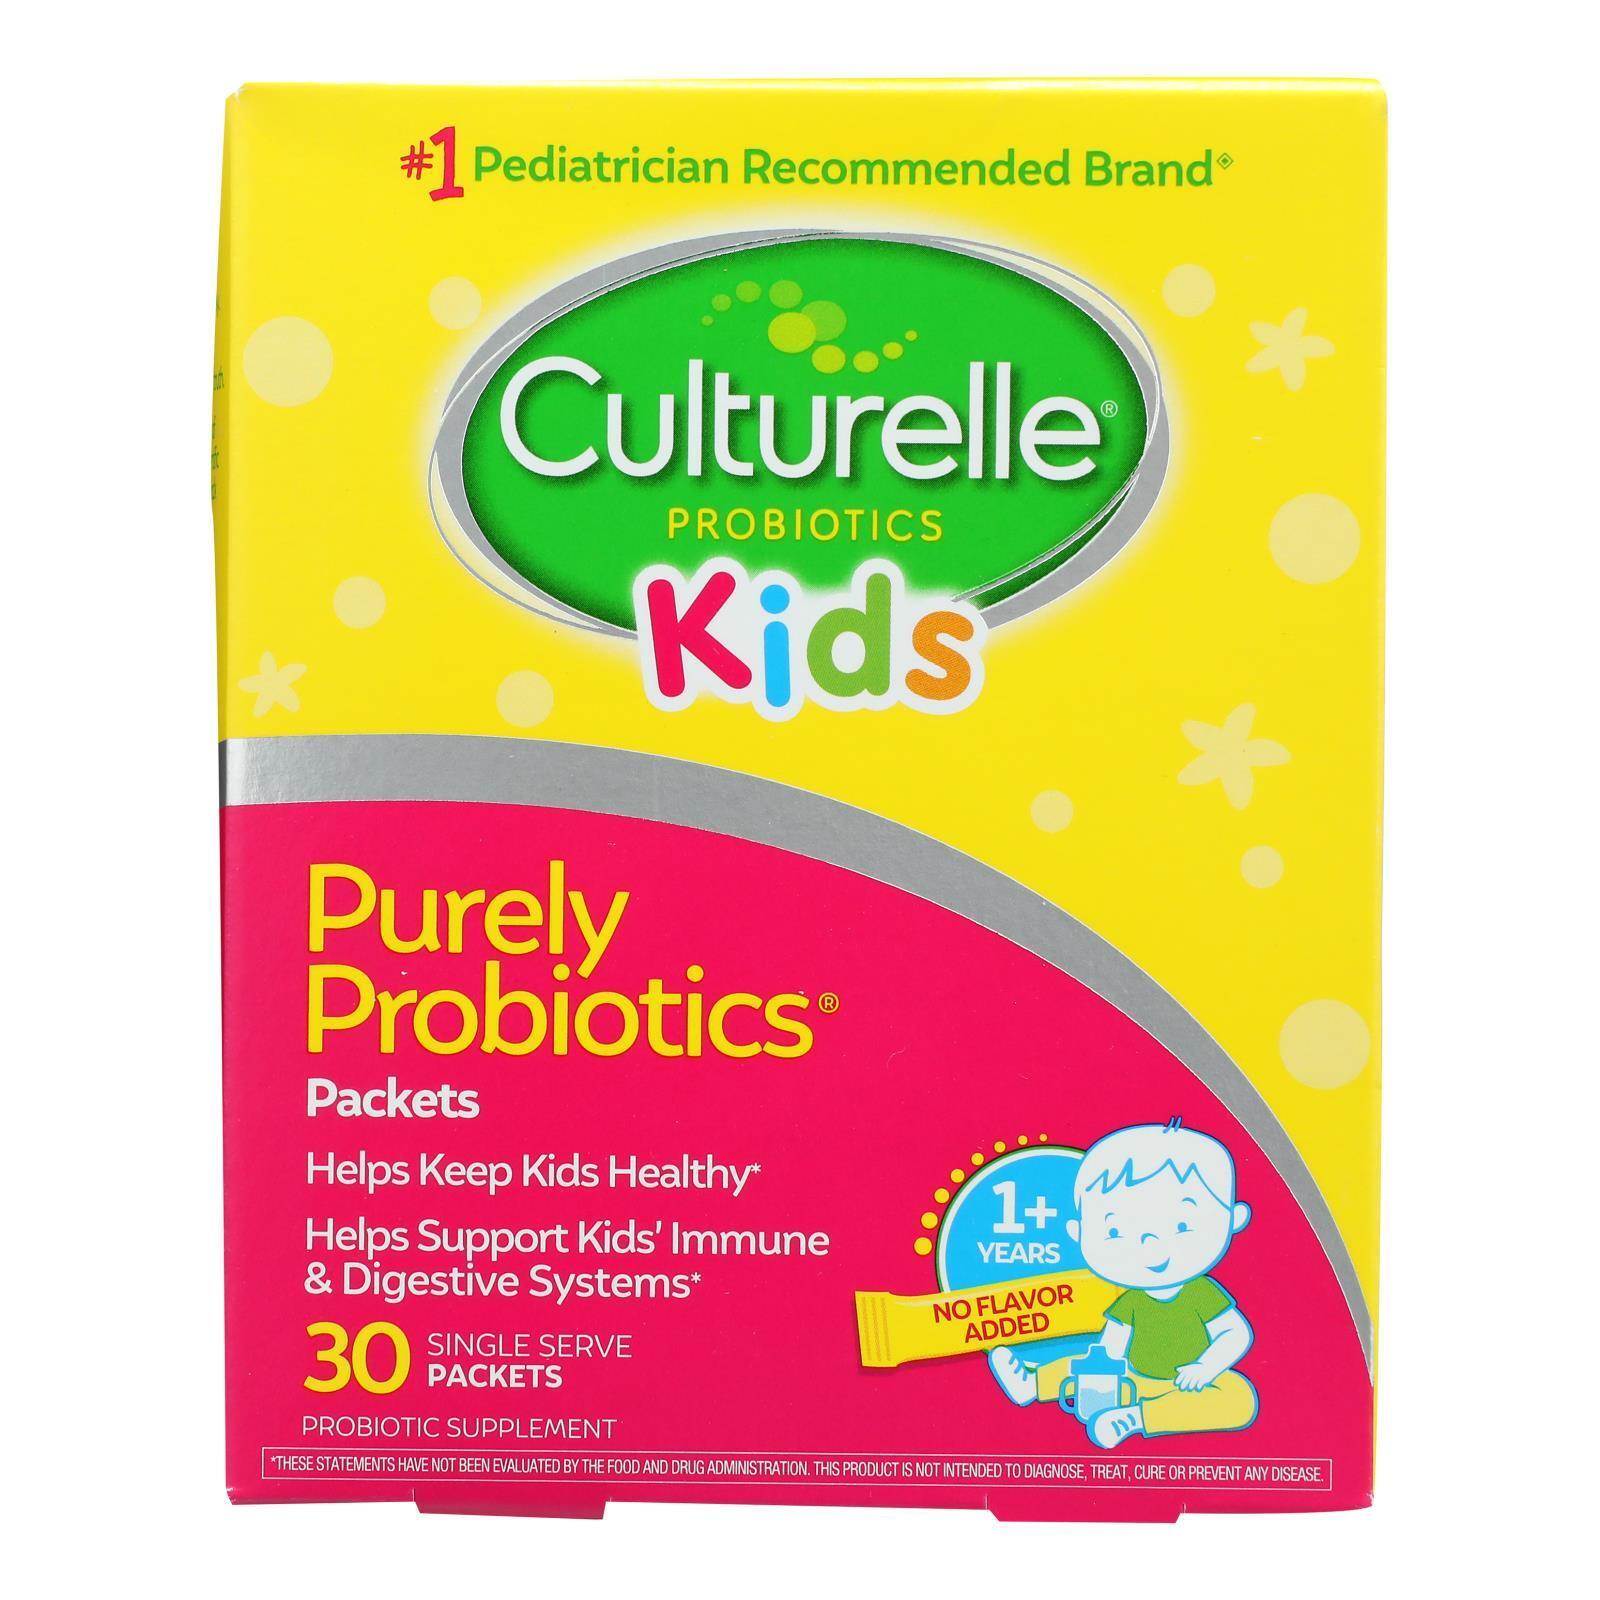 Culturelle Probiotics for Kids - 30 Packets